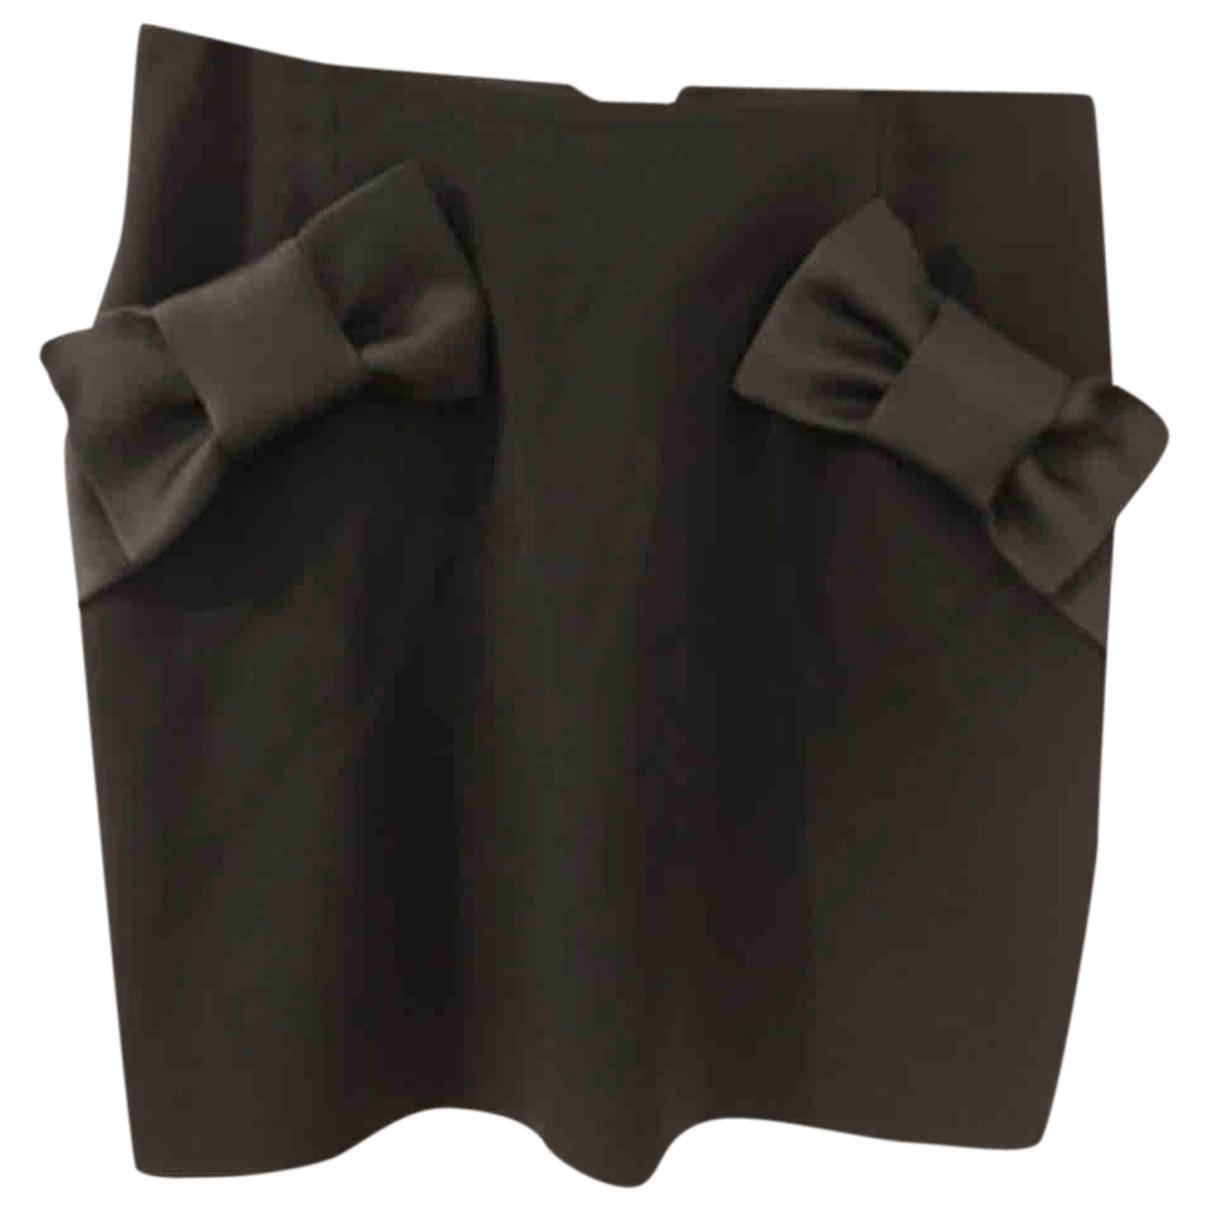 Claudie Pierlot \N Black Cotton skirt for Women 36 FR